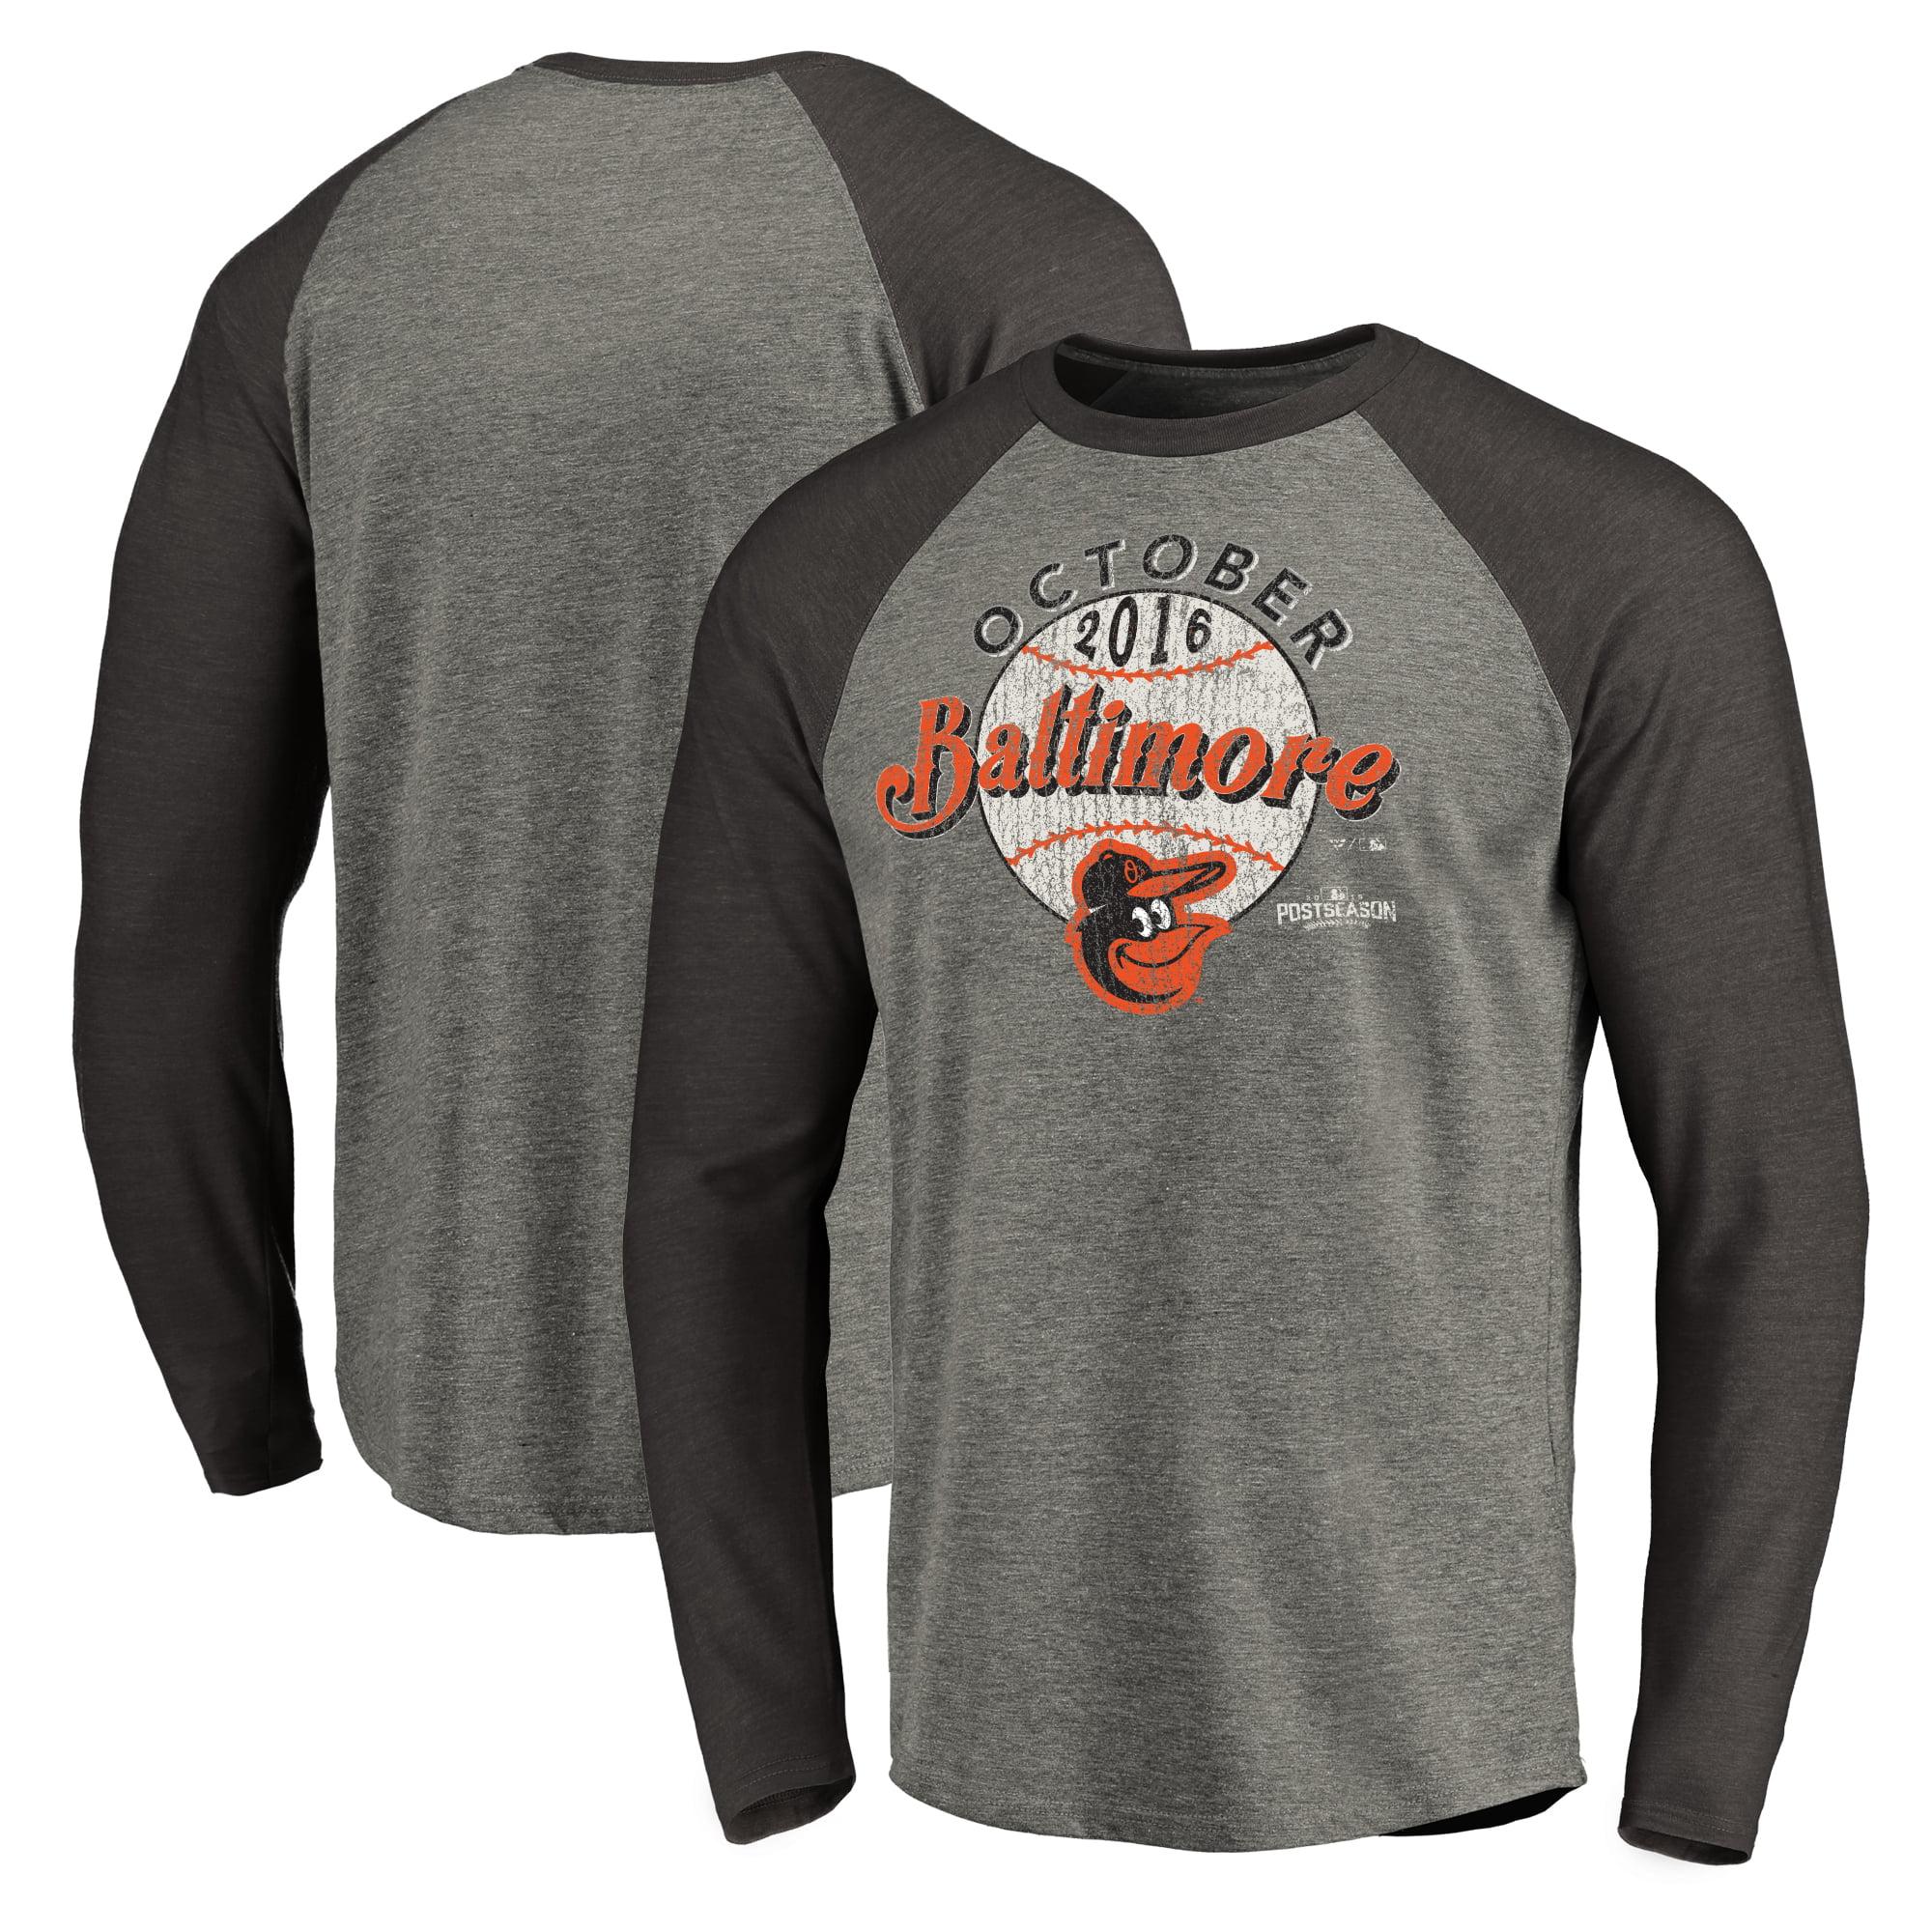 Baltimore Orioles 2016 Postseason Clutch Long Sleeve Raglan T-Shirt - Black